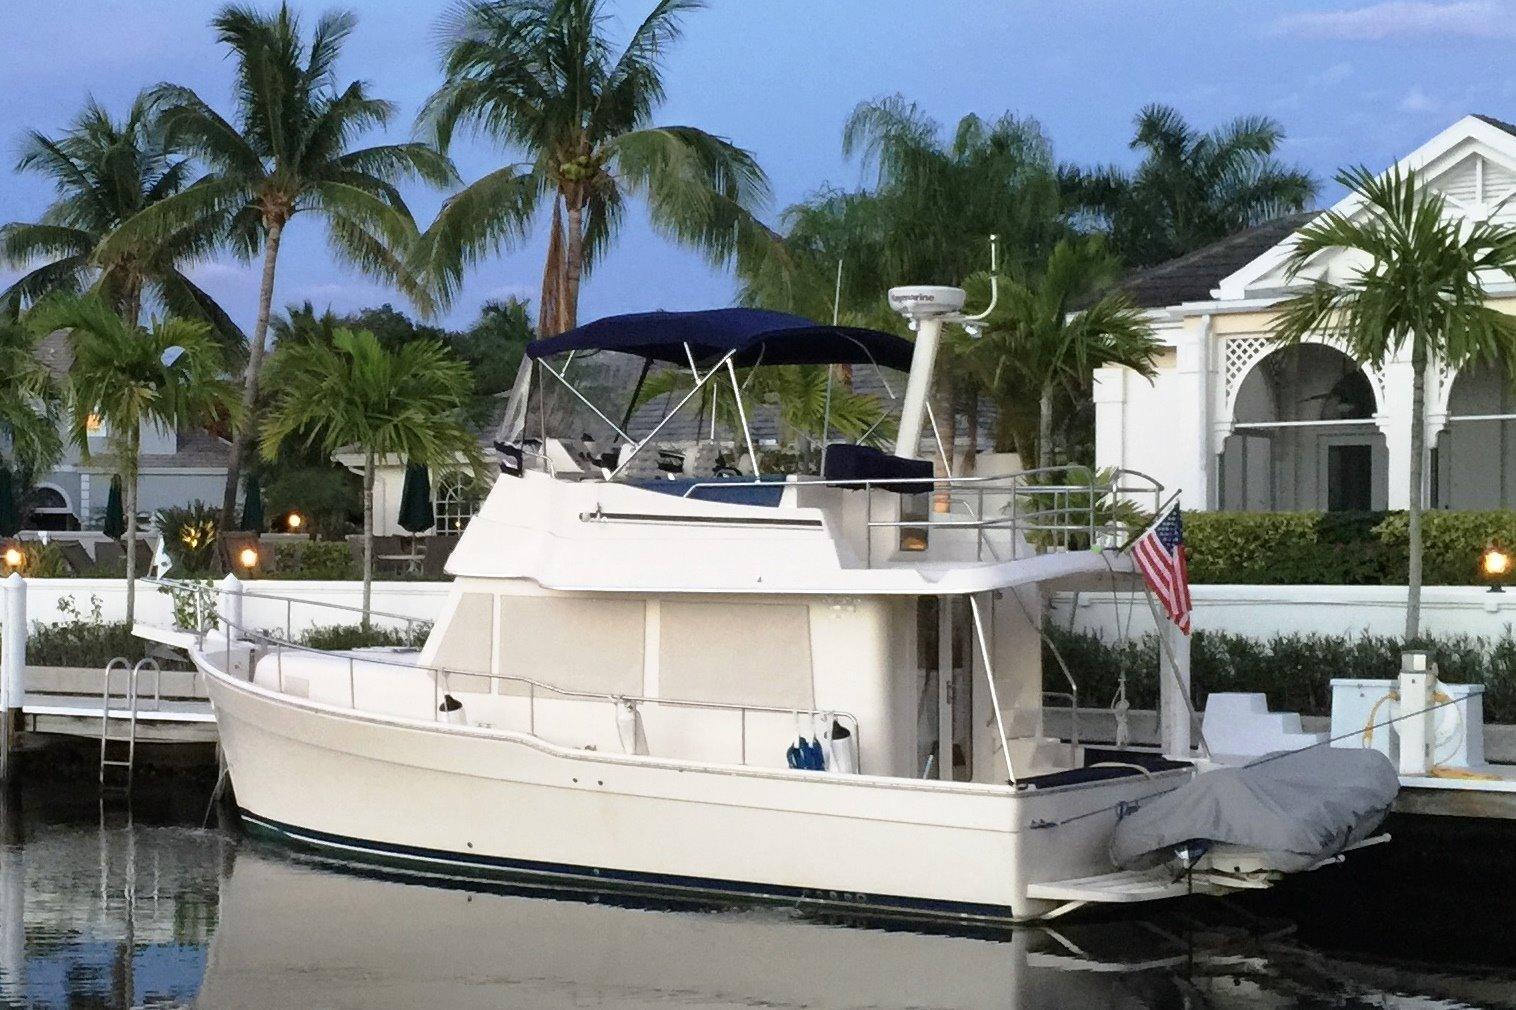 5973055_20161019142450647_1_XLARGE?w=800&h=400 2008 mainship 34 trawler 5973055  at love-stories.co